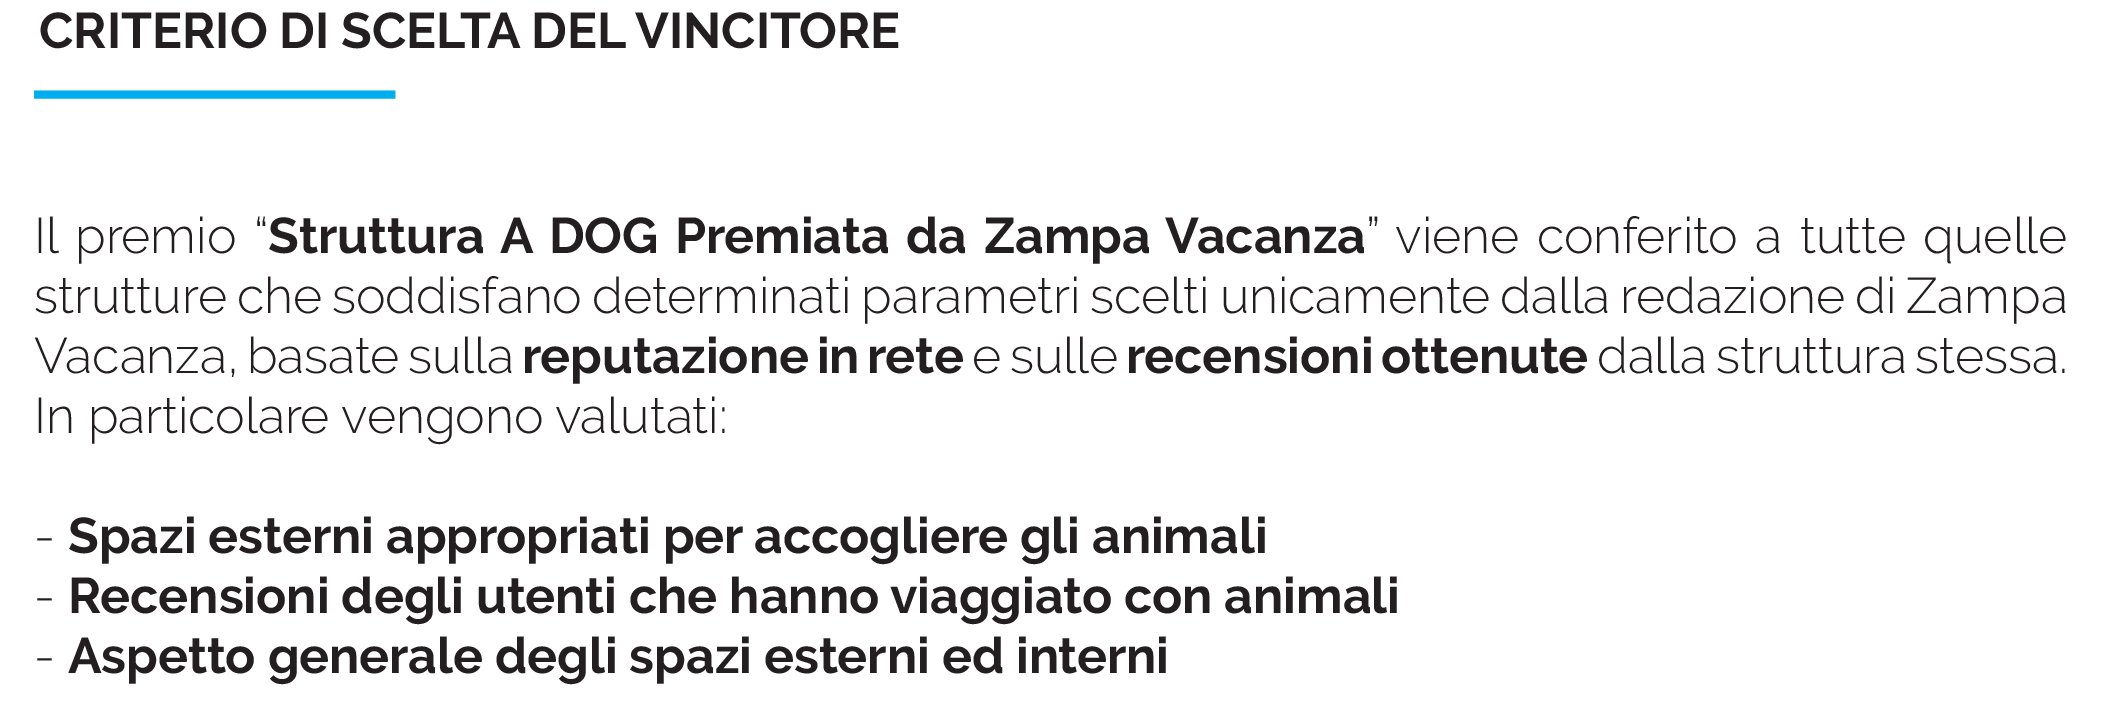 Premio-struttura-A-DOG-(1)-2